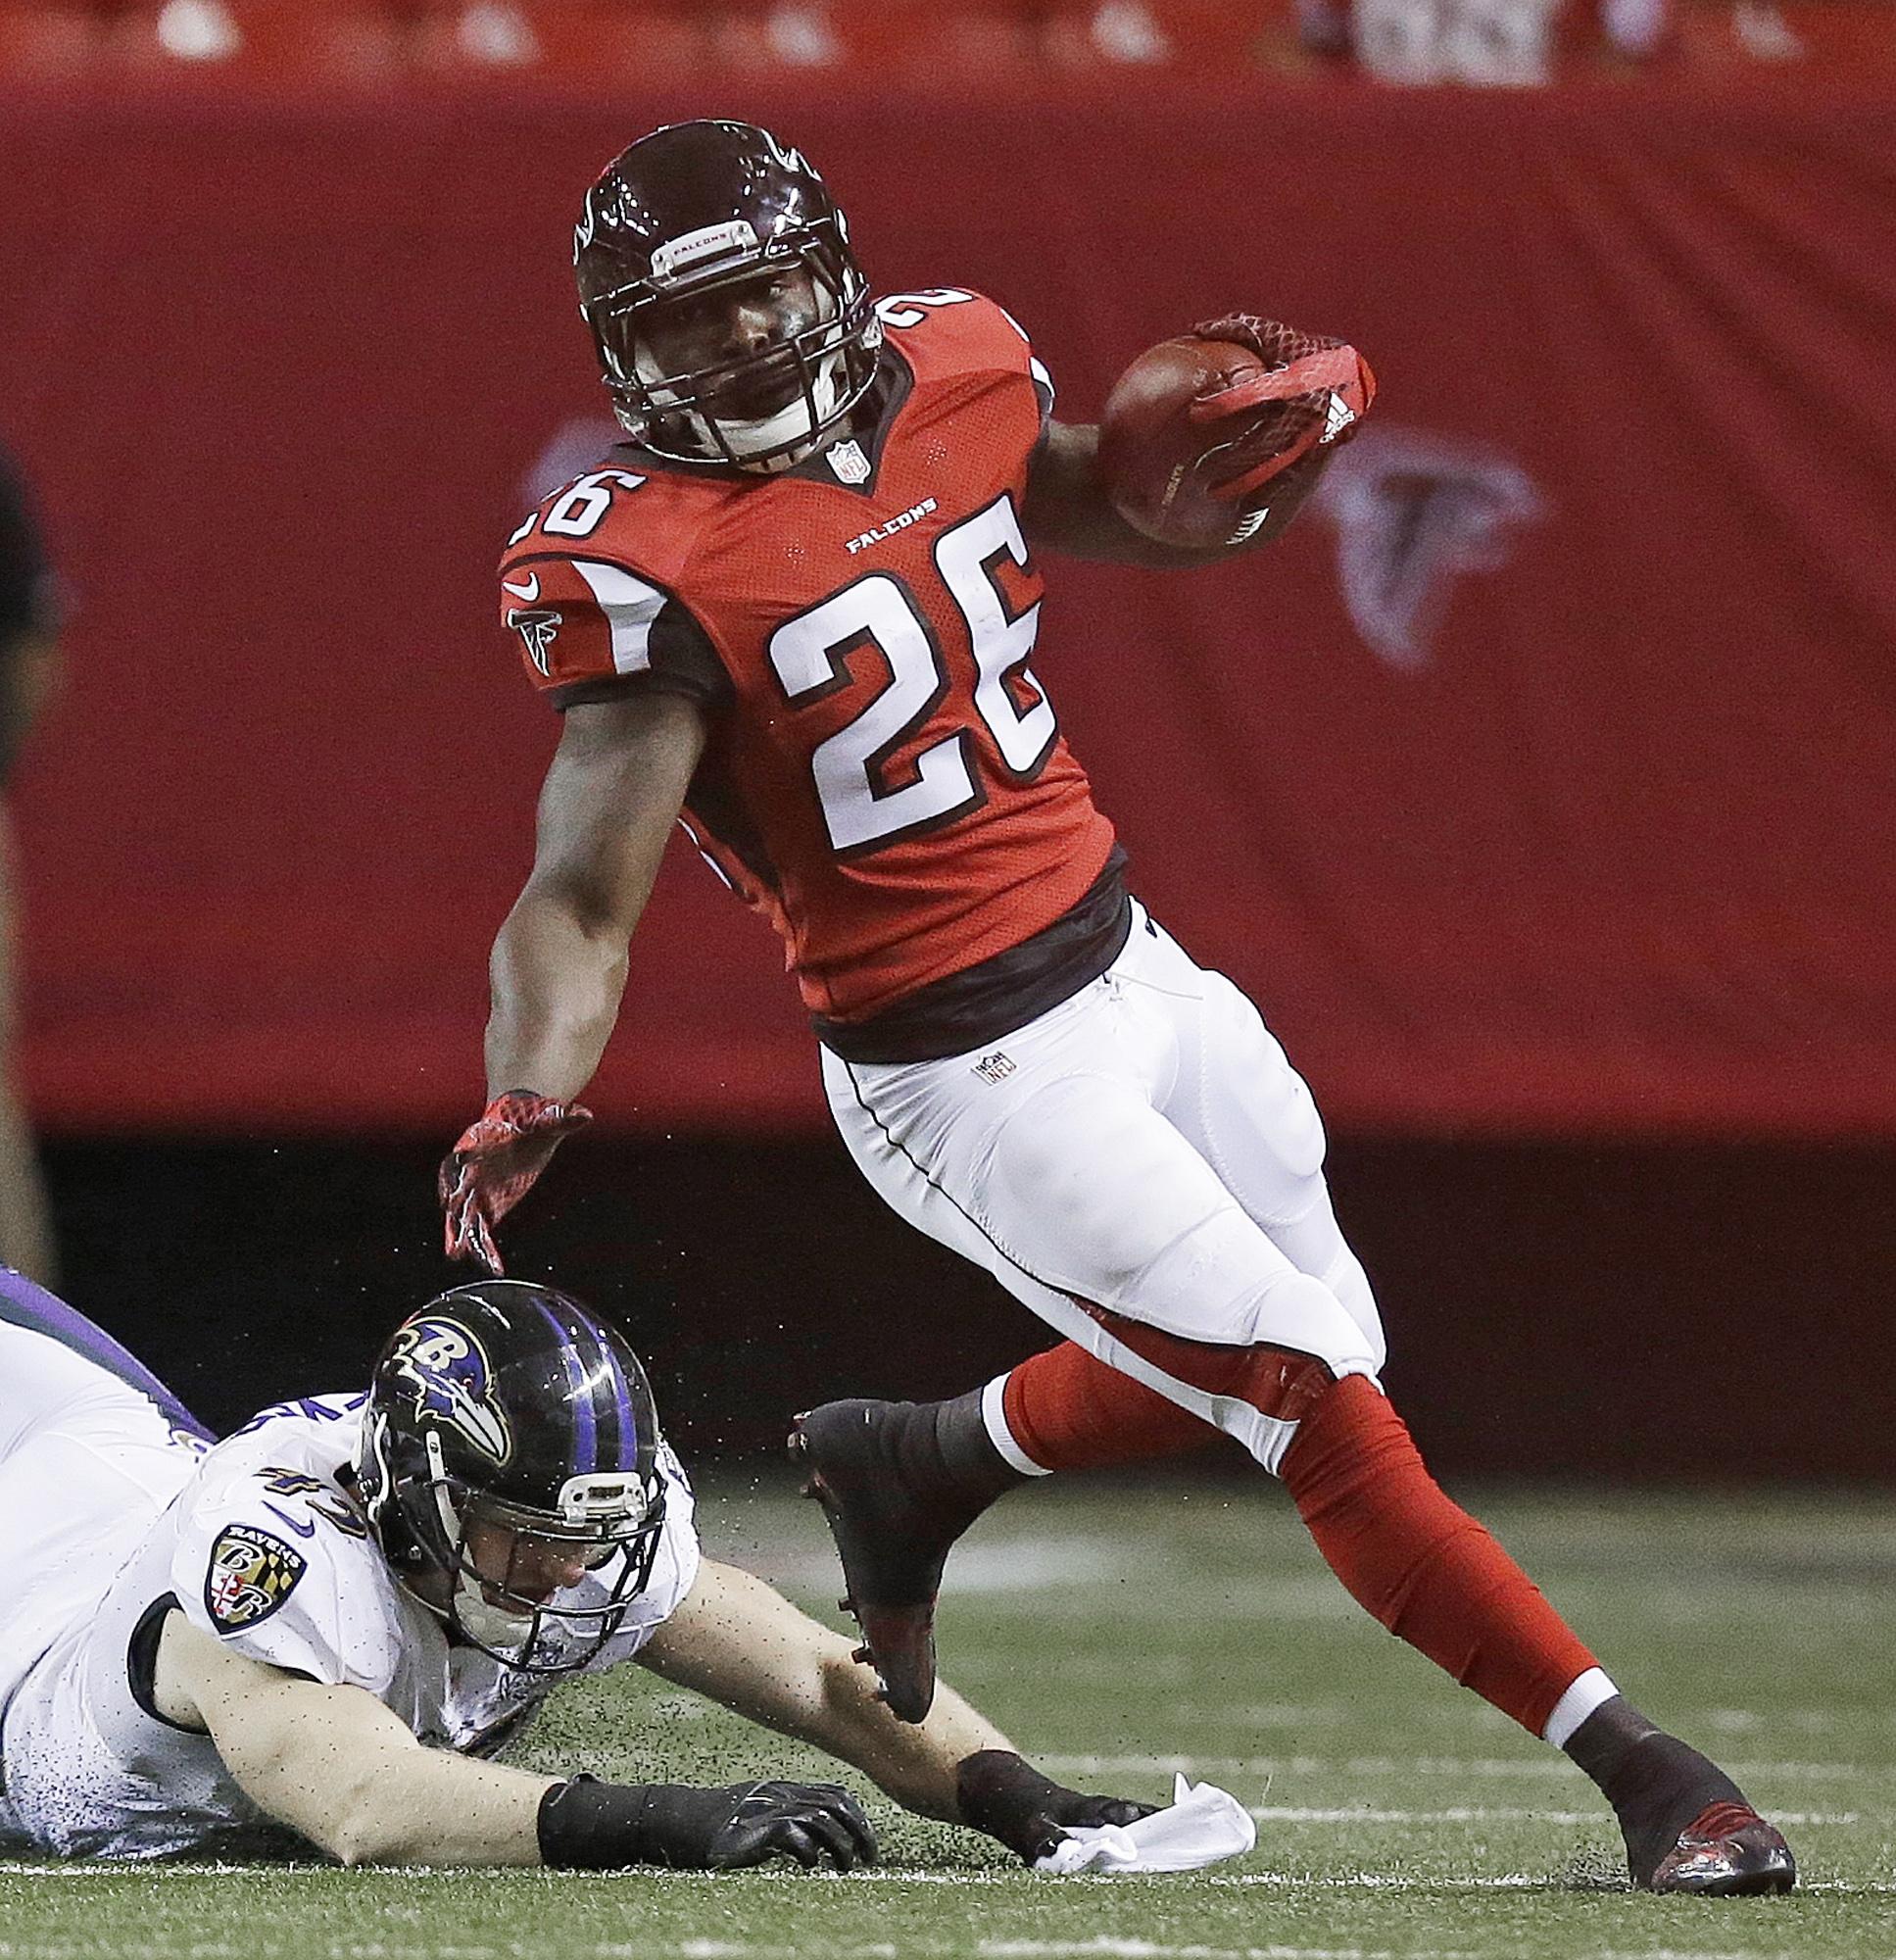 Atlanta Falcons running back Tevin Coleman (26) Baltimore Ravens linebacker Brennen Beyer (45) during the first half of an NFL football preseason game, Thursday, Sept. 3, 2015, in Atlanta. (AP Photo/Brynn Anderson )